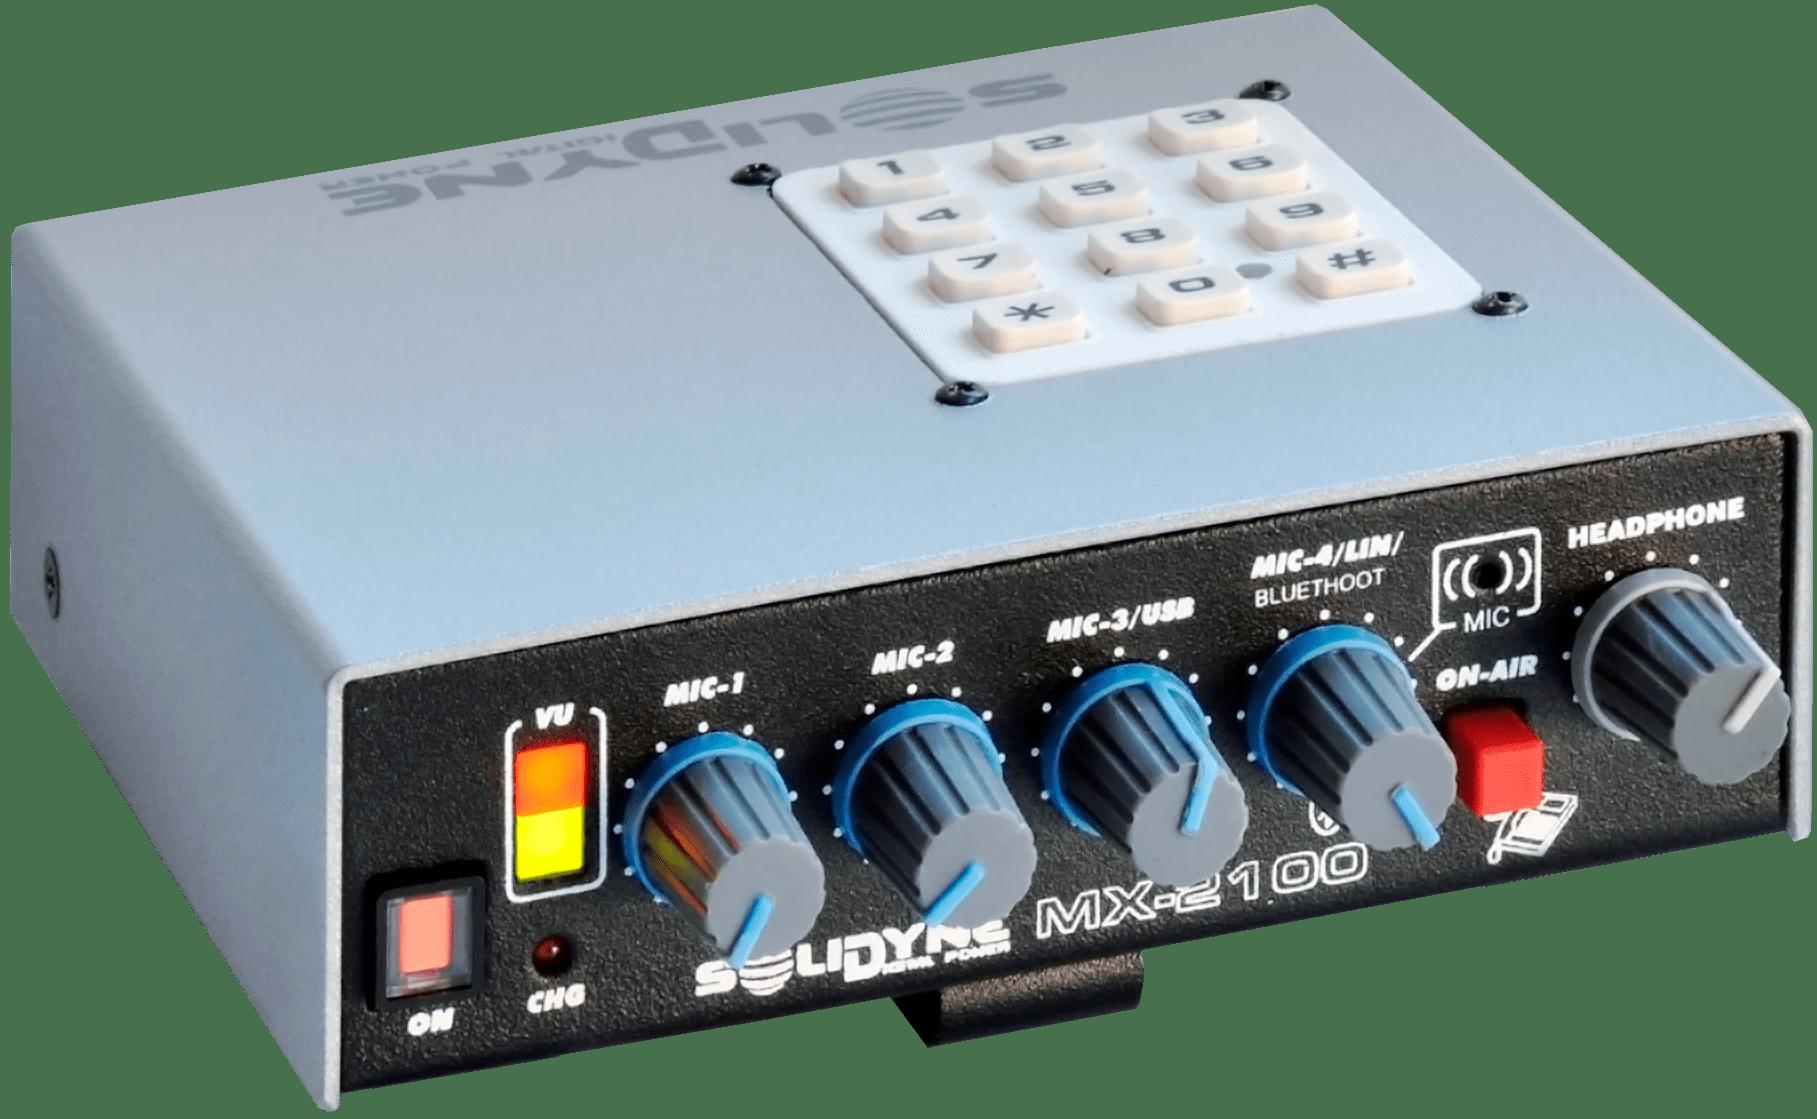 Consola-Portatil-MX2100-Streaming-Solidyne-Televisión-Radio-Emisoras-FM-AM-Internet-Virtual-Online-Buena-Imagen-Bogotá-Colombia